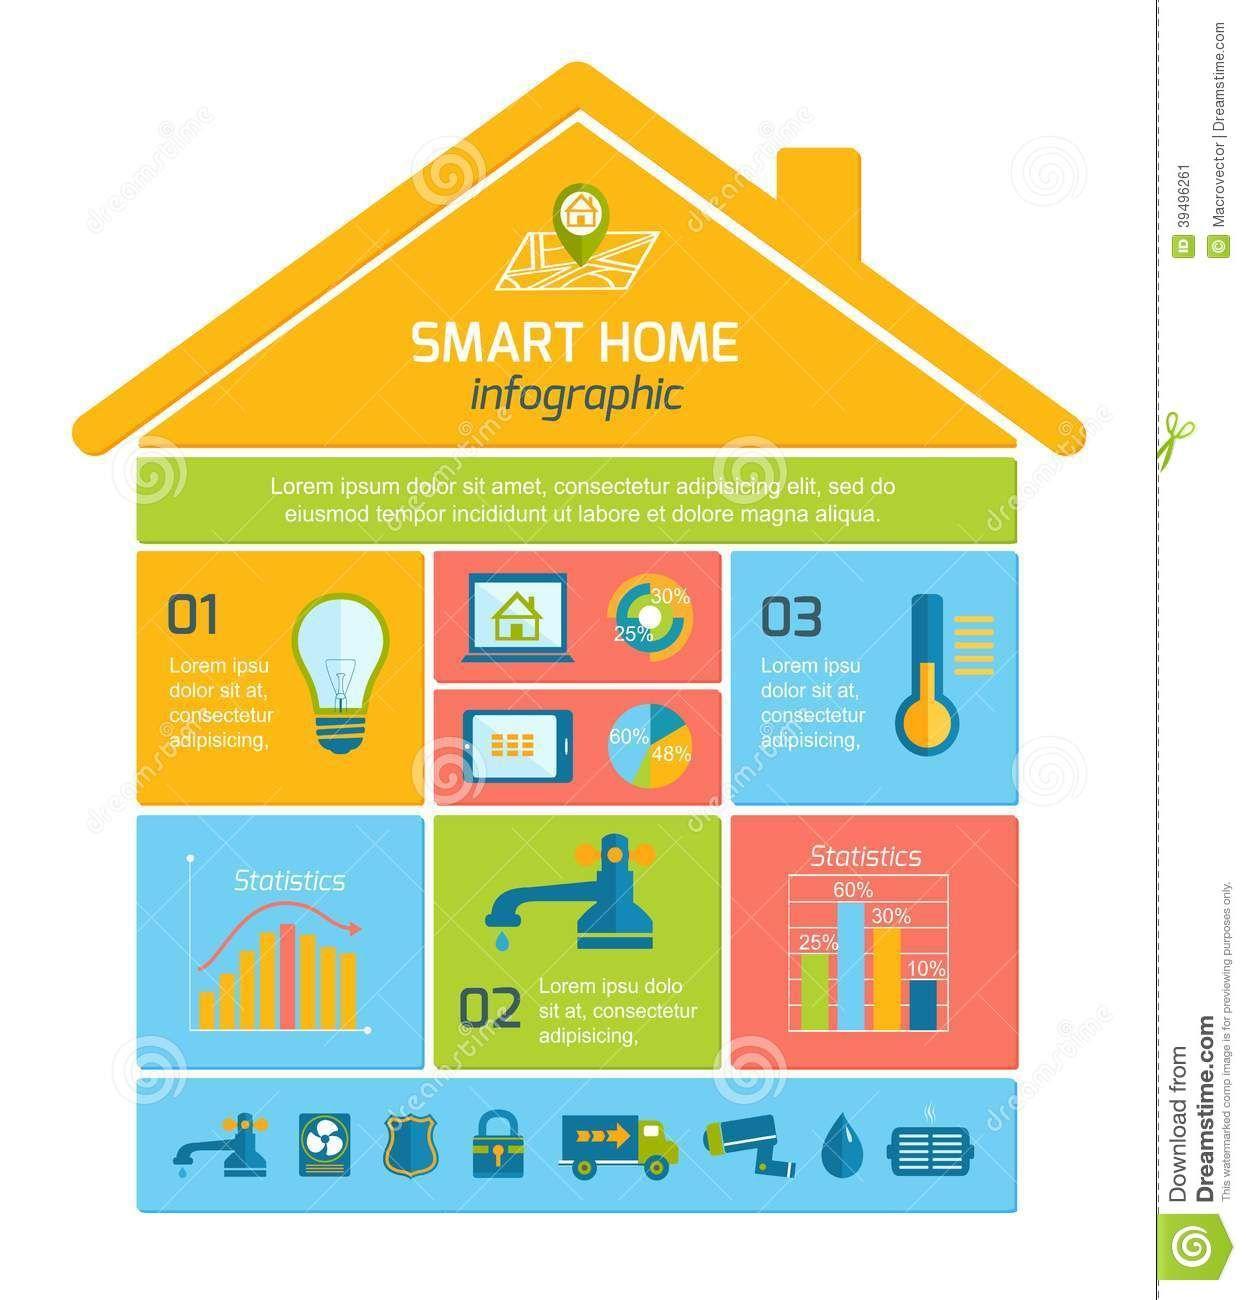 Best Kitchen Gallery: Smart Home Infographic Home Automation Infographics Pinterest of Home Automation Design  on rachelxblog.com